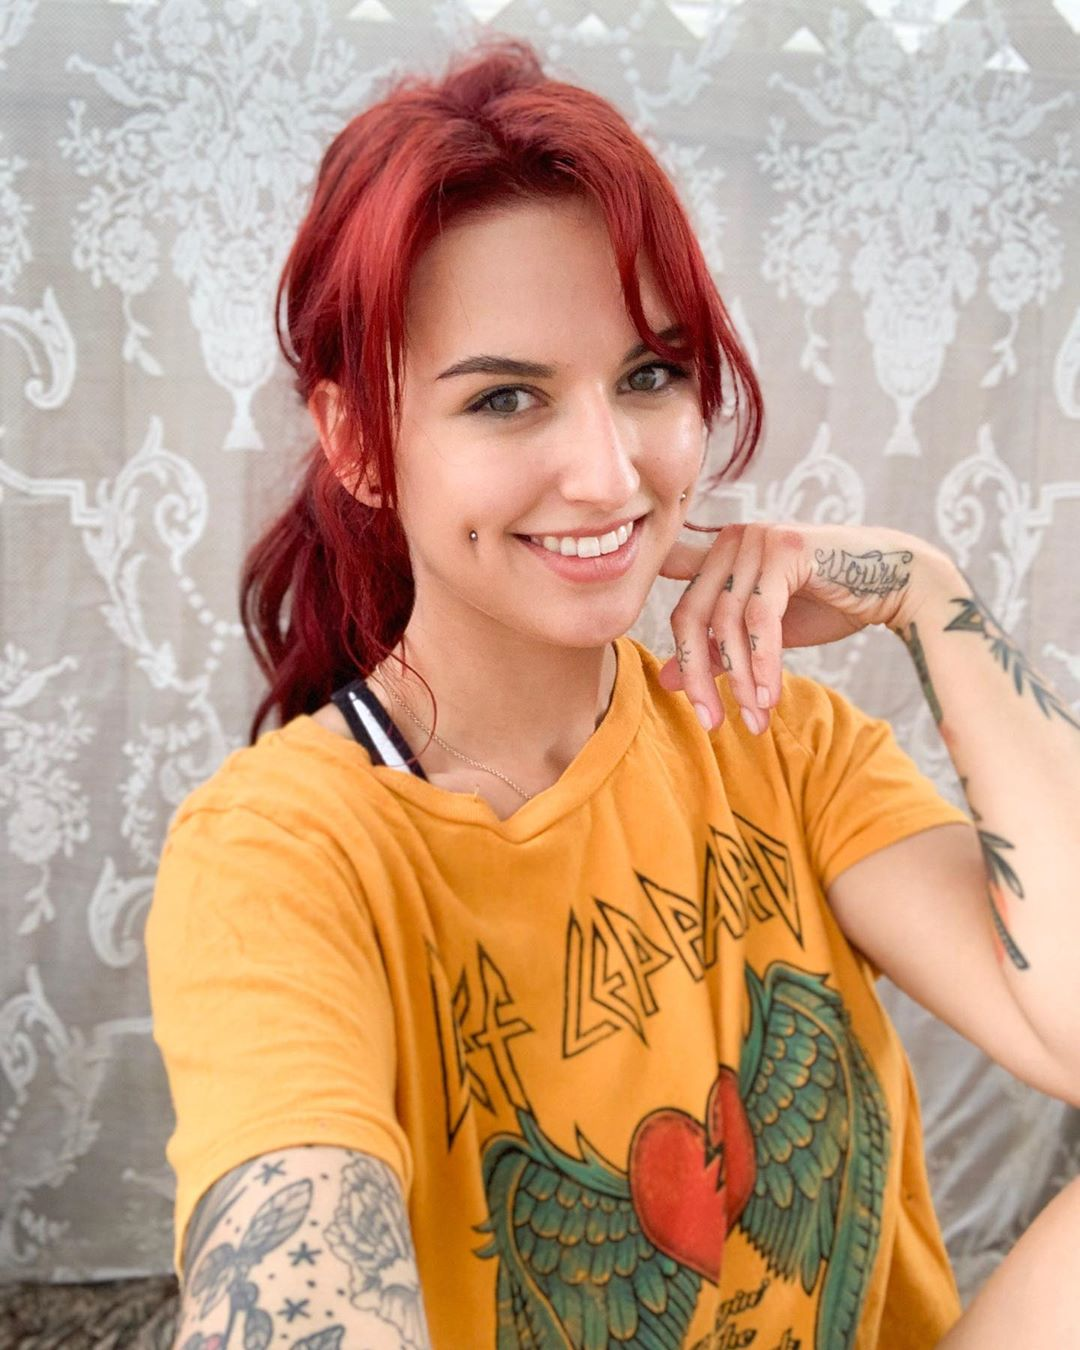 Octavia-May-Wallpapers-Insta-Fit-Girls-2